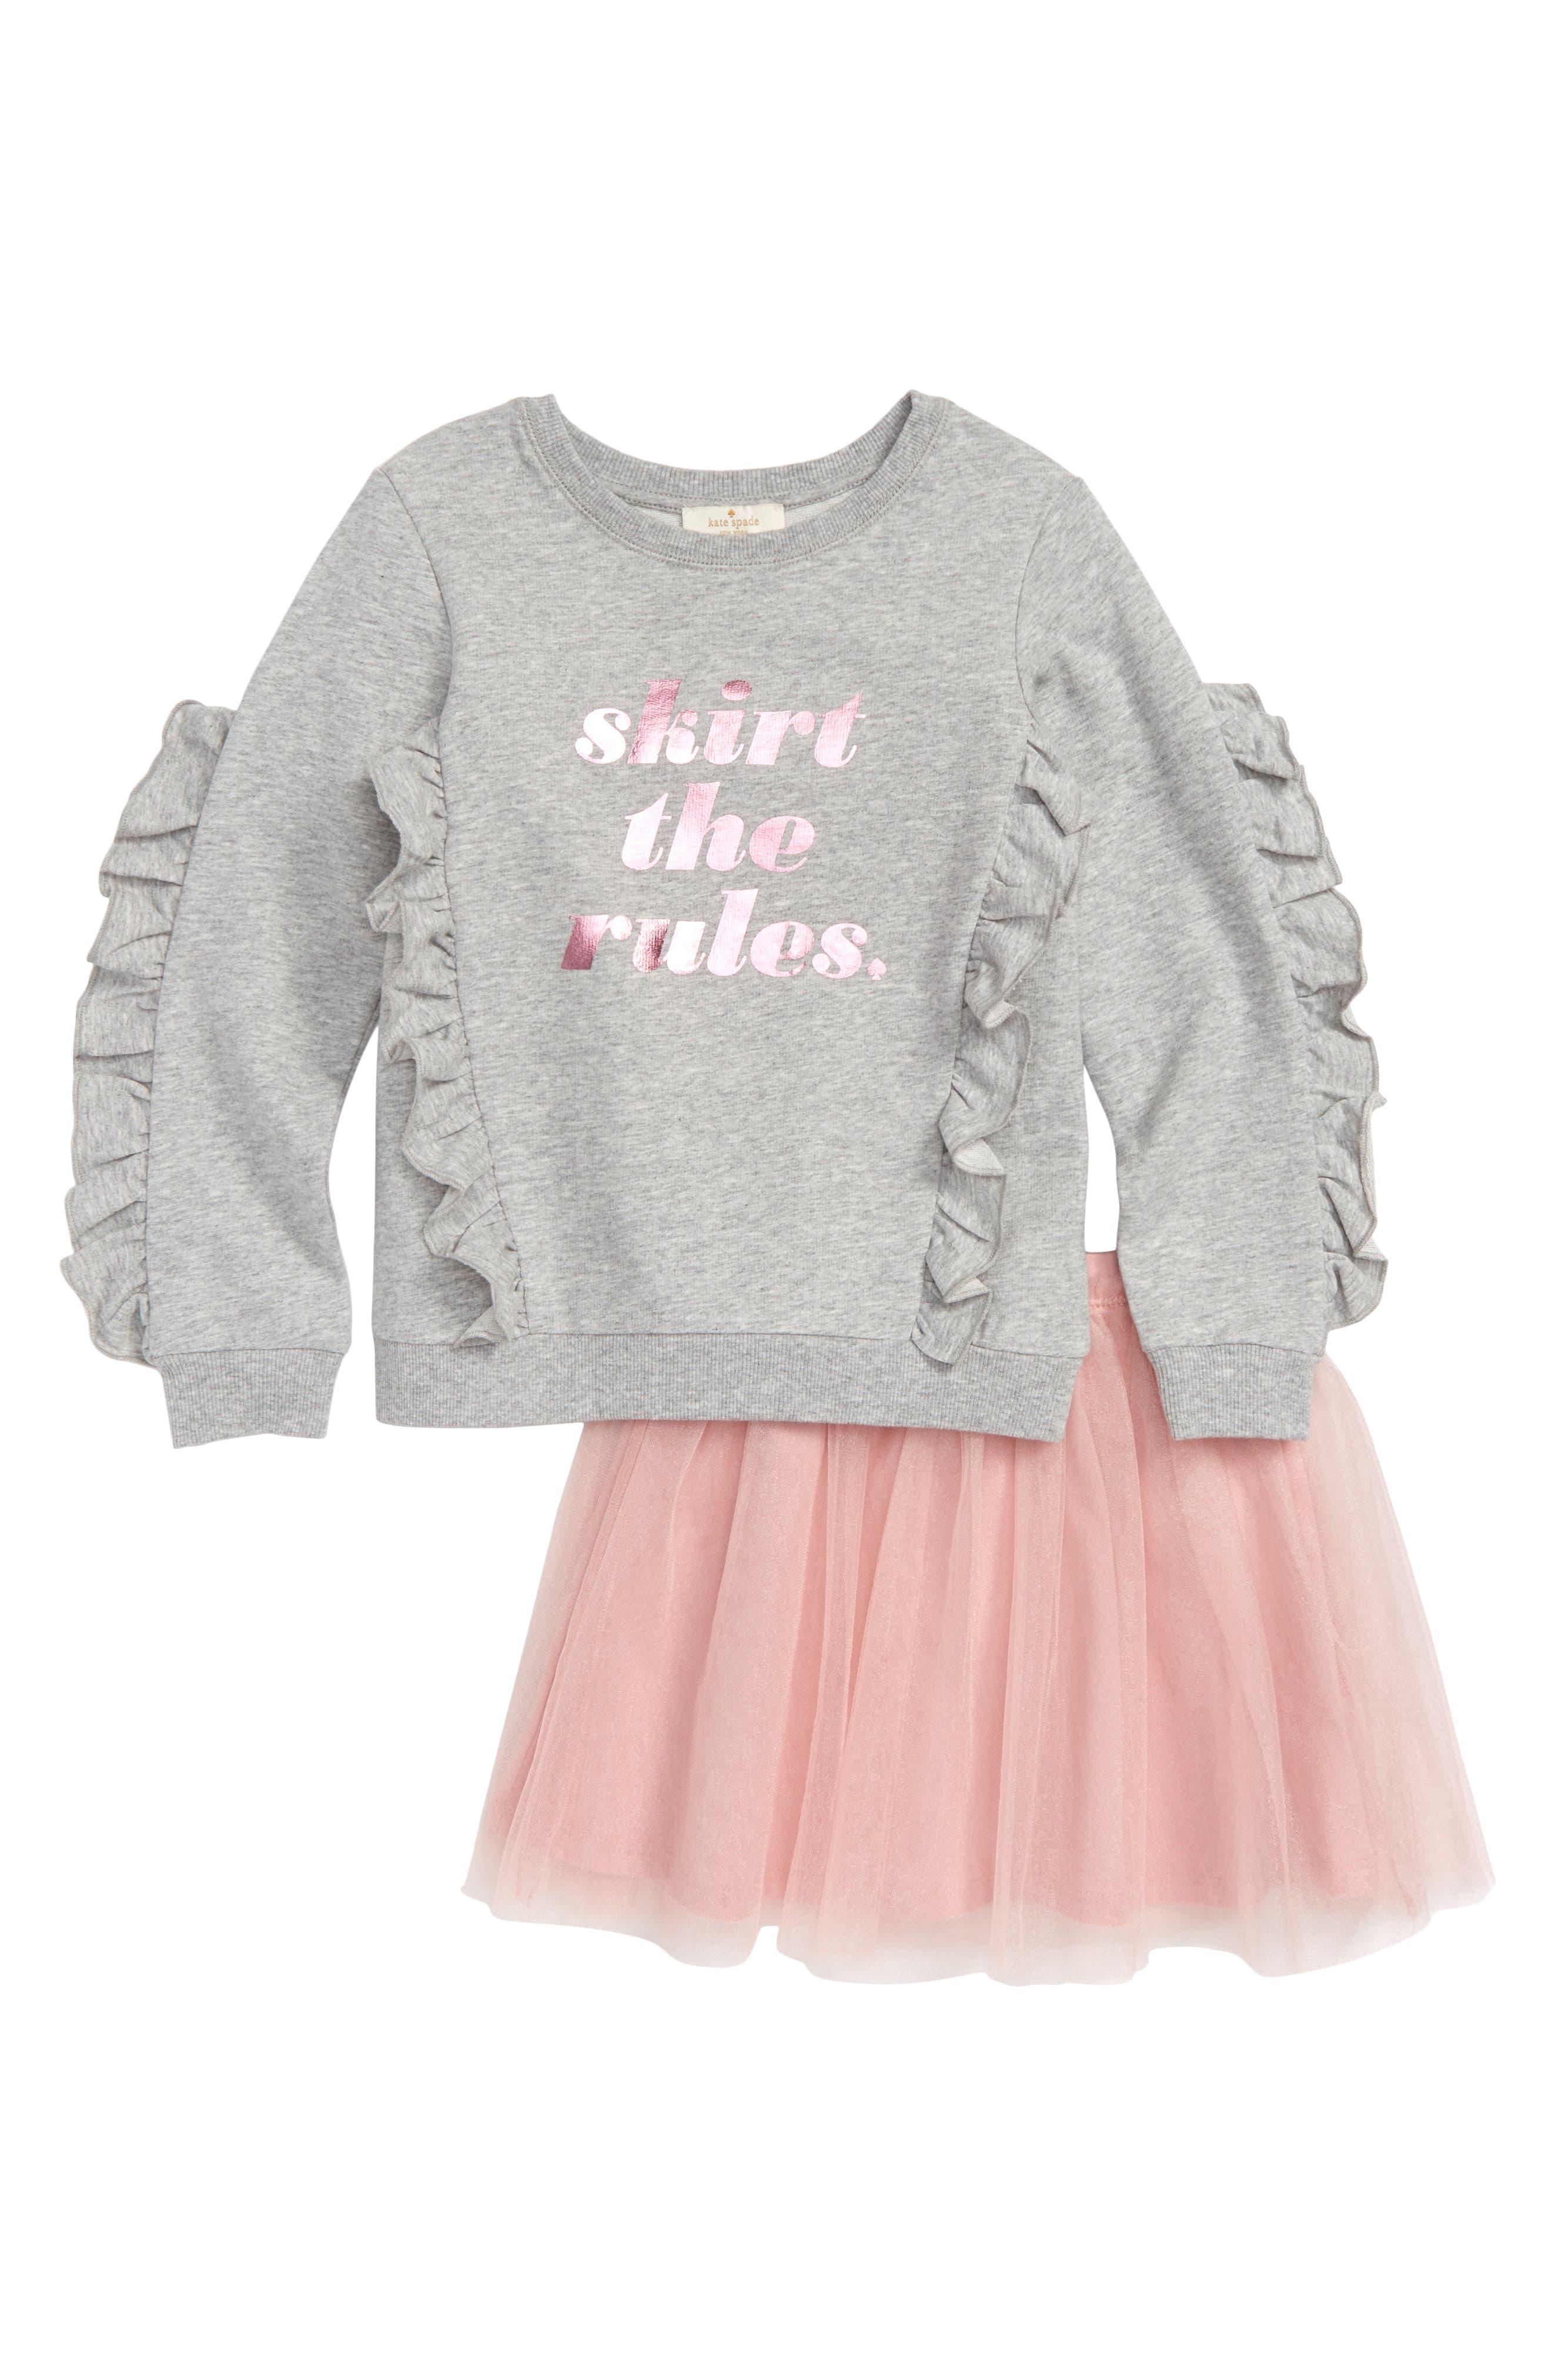 skirt the rules sweatshirt & tulle skirt set,                         Main,                         color, HEATHER GREY